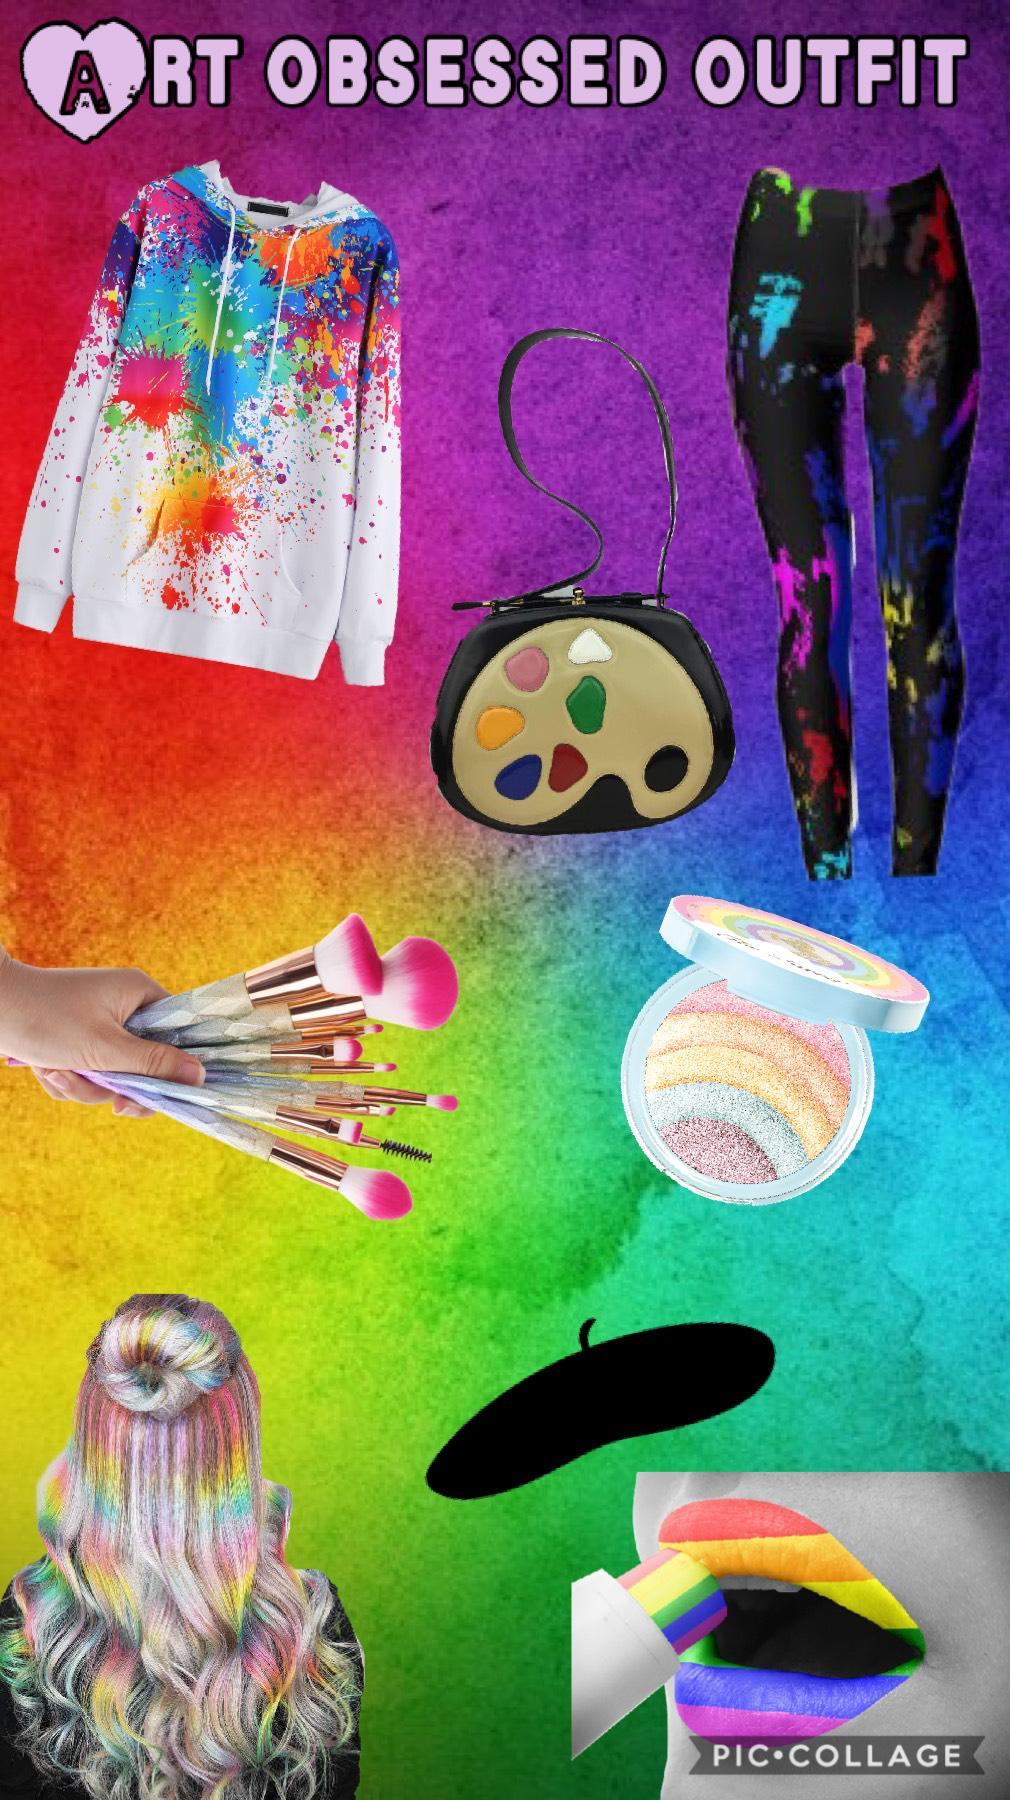 Art obsession outfit Tap Splatter paint shirt Leggings with paint drips Paint palette bag Rainbow makeup stuff Rainbow hair highlights Art beret